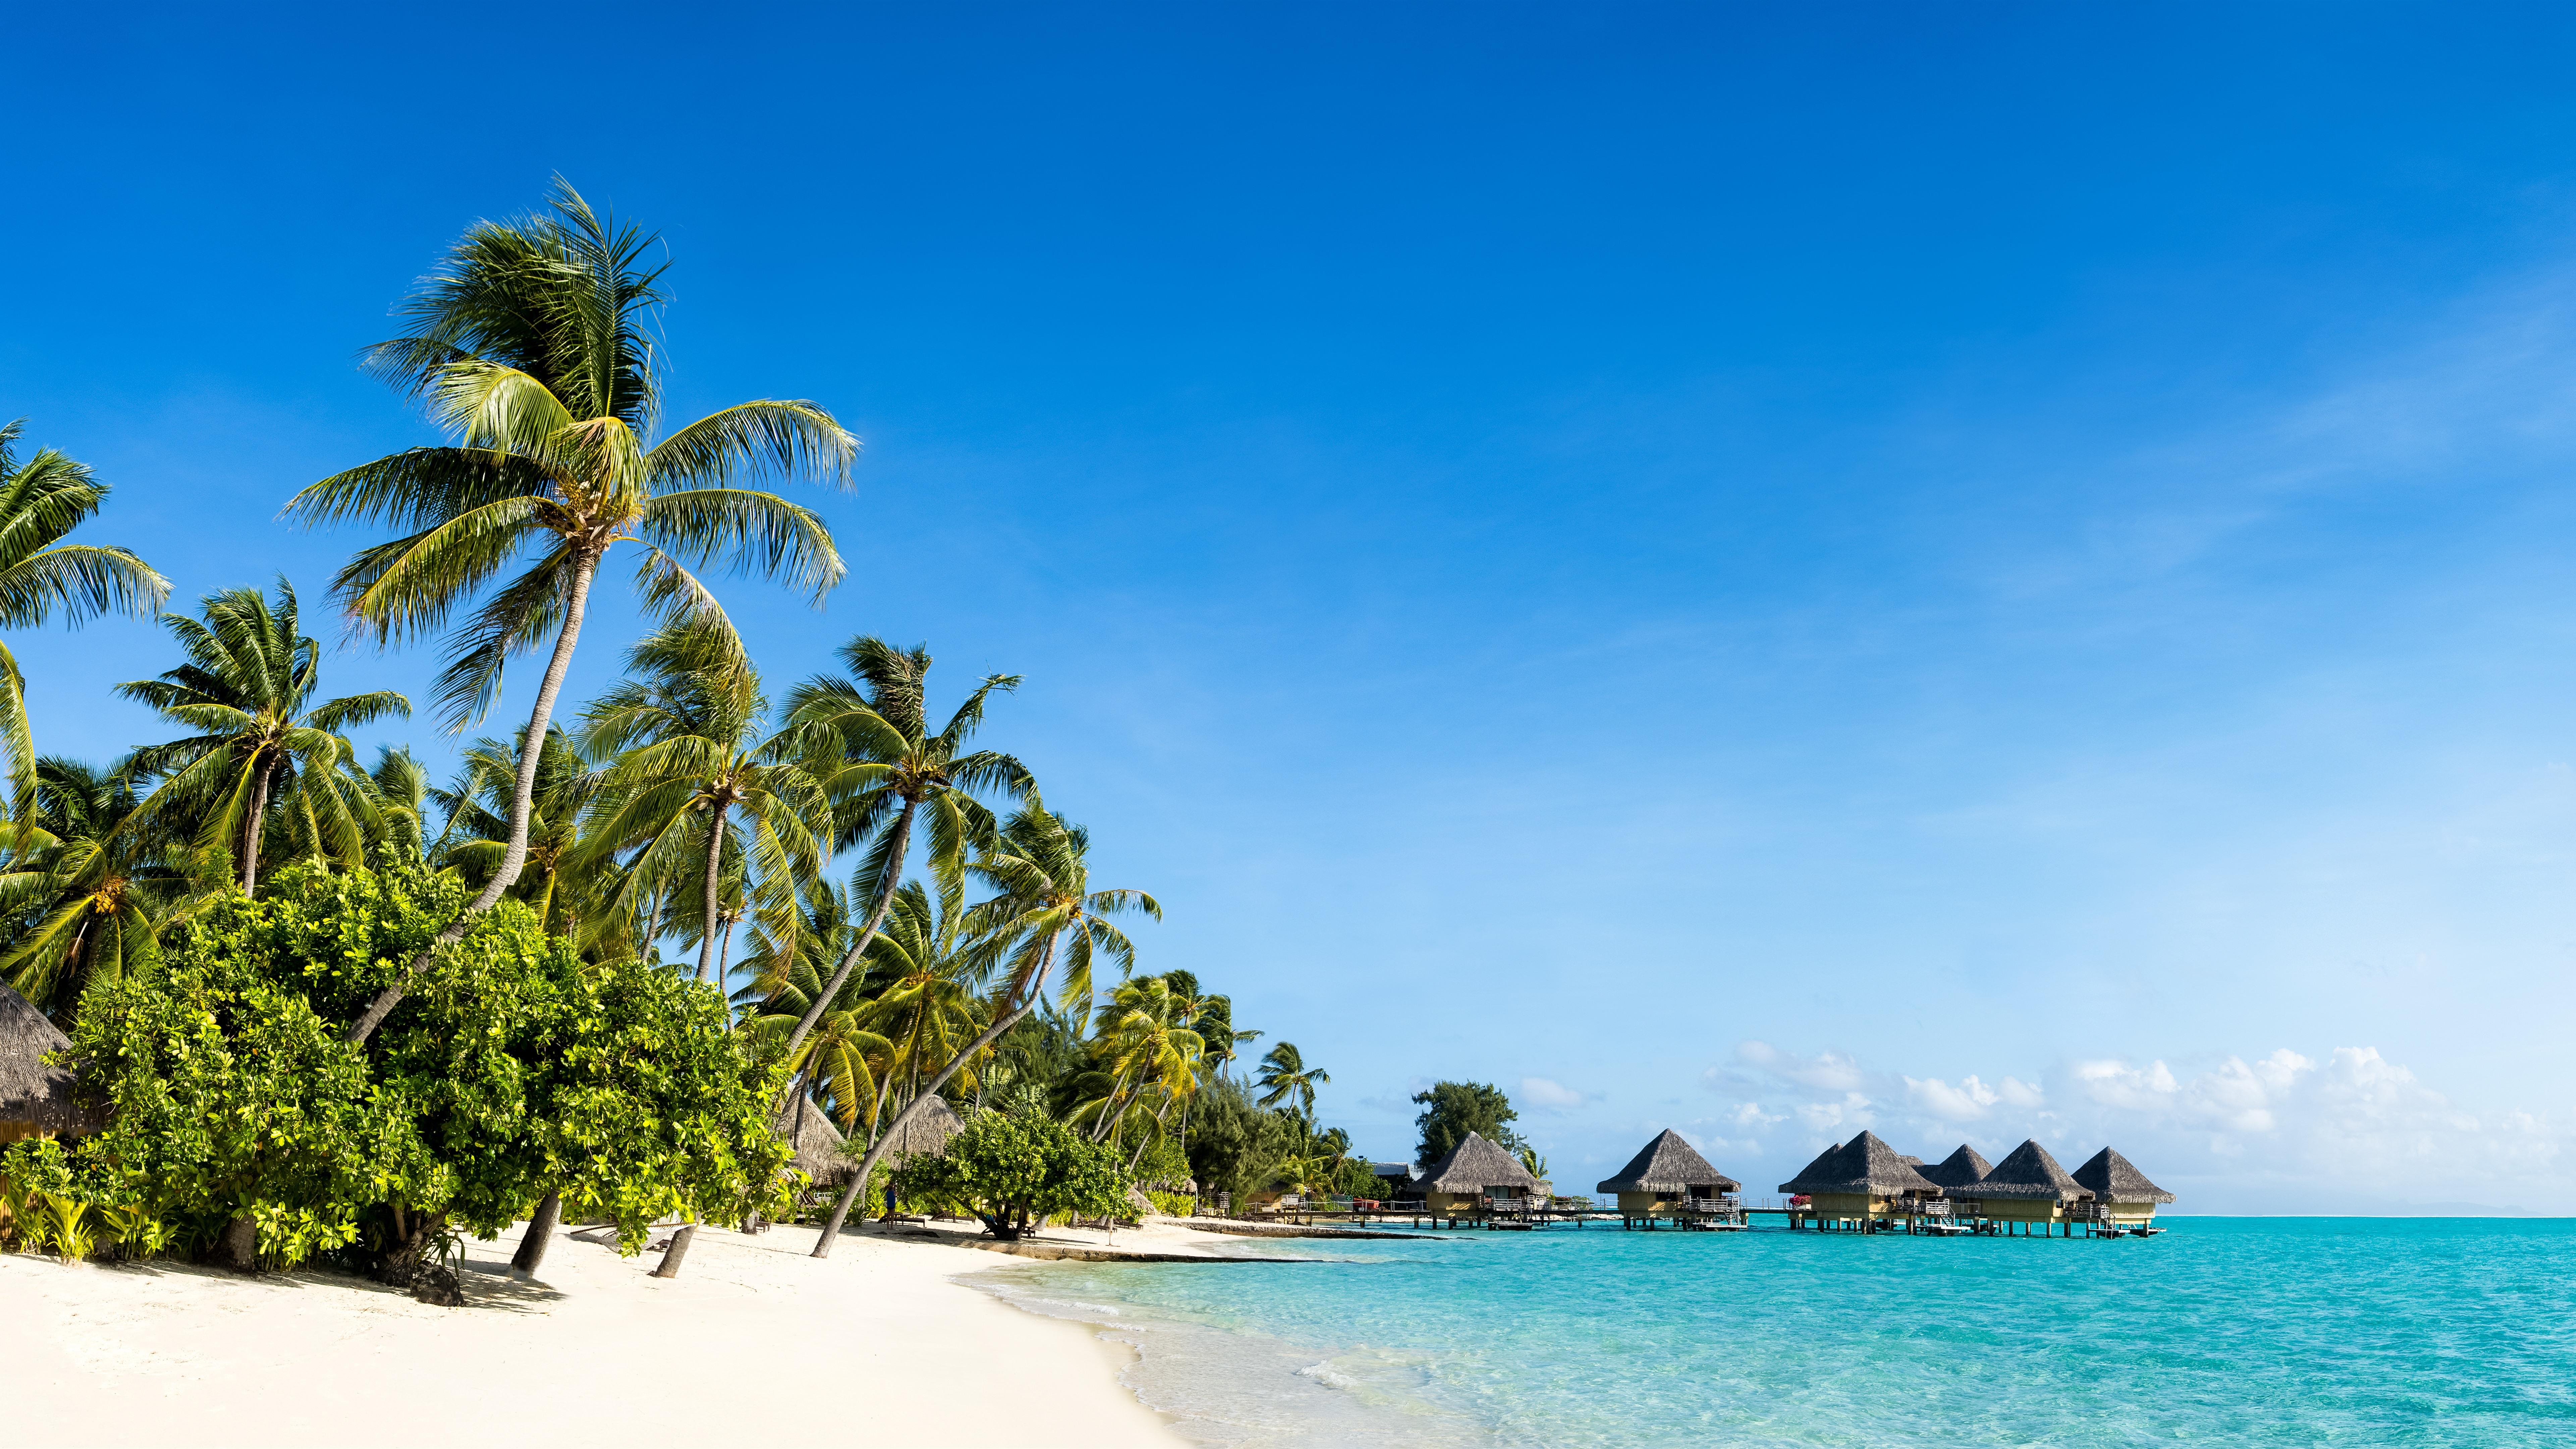 Nature Scenery Beach Sea Palm Trees